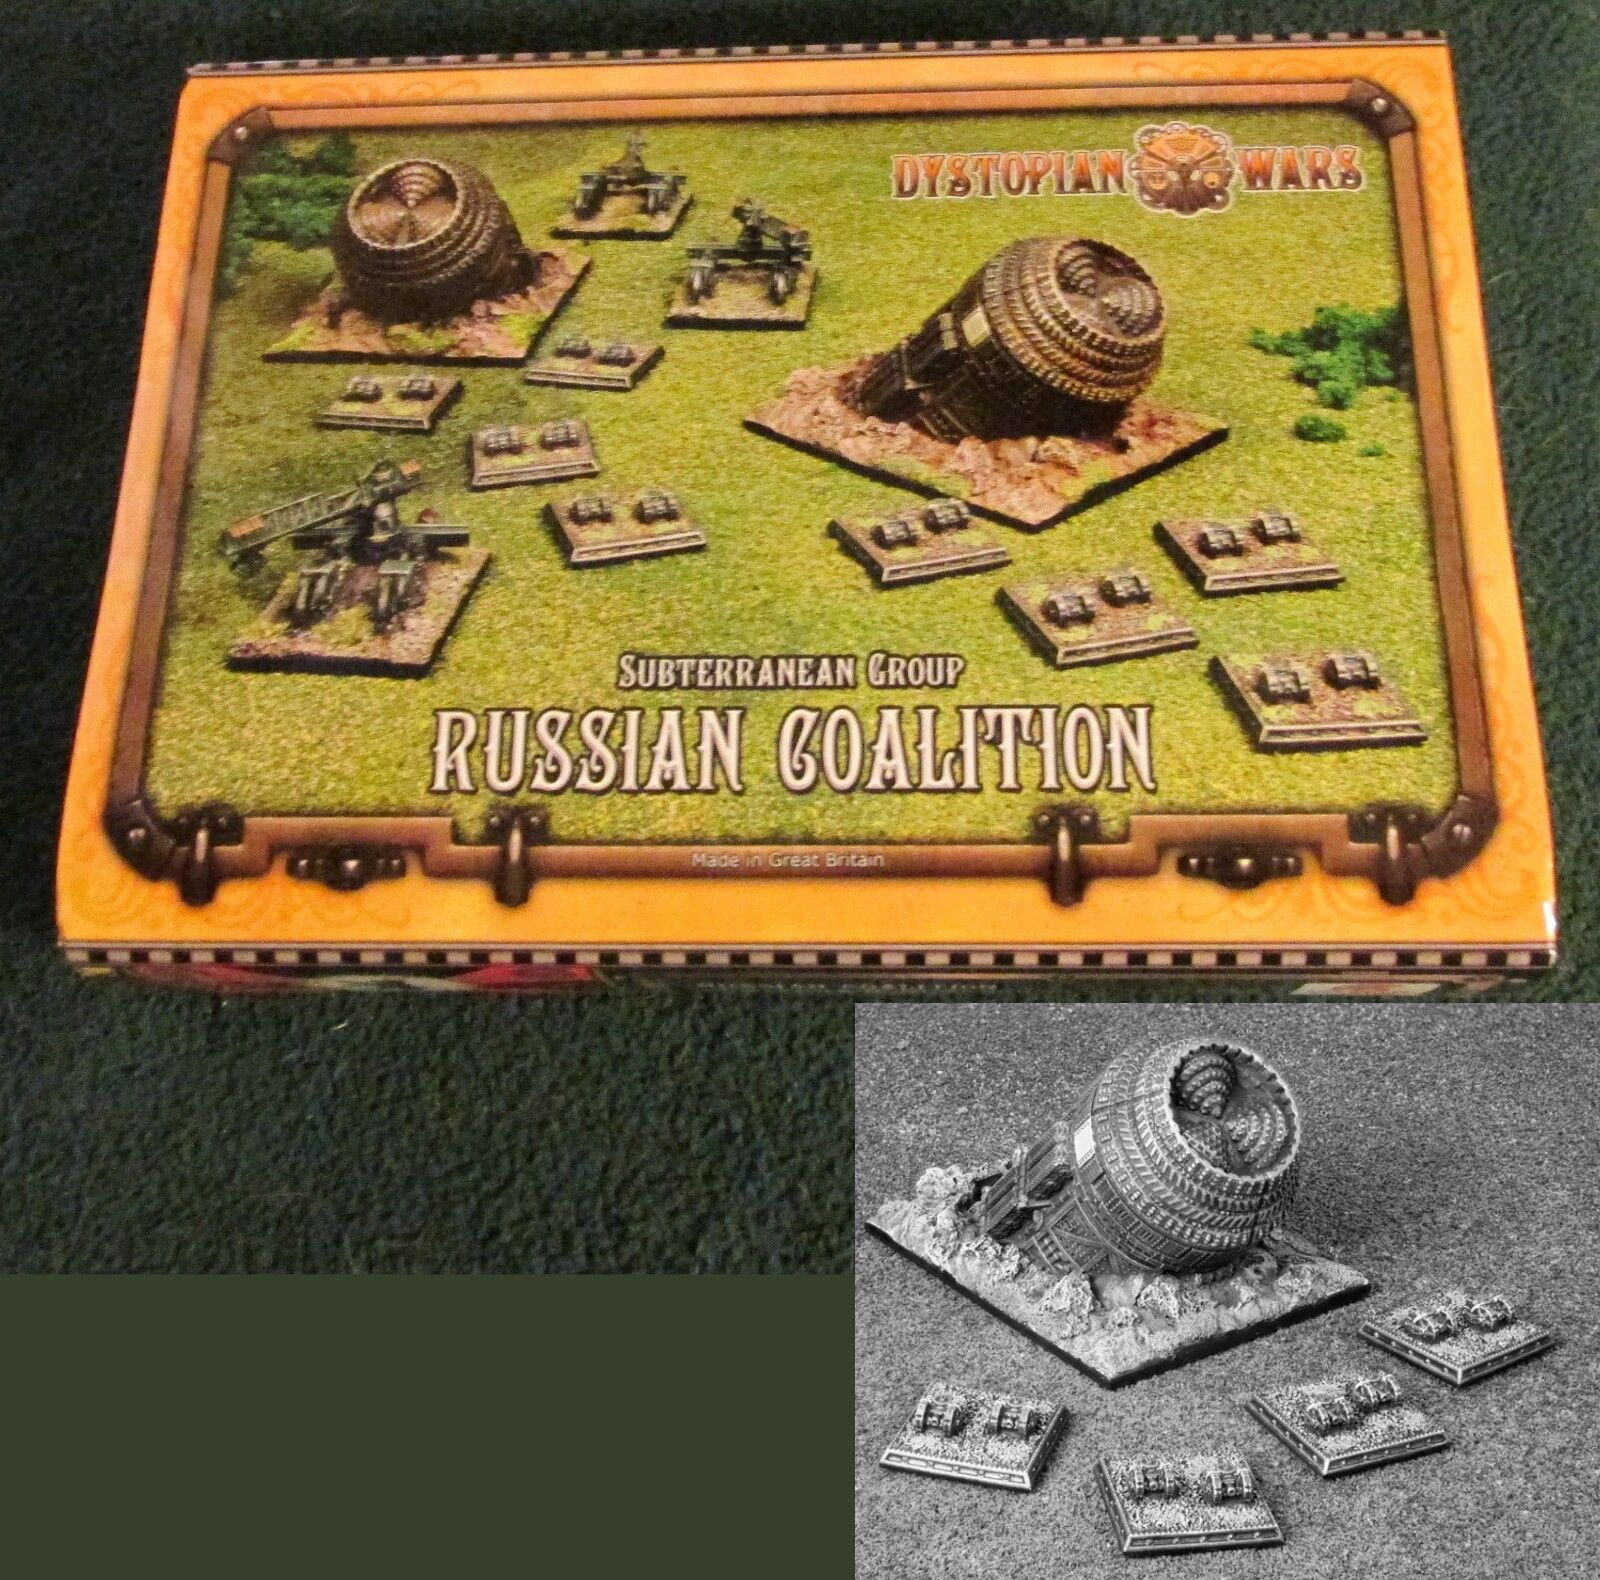 Dystopian Wars DWRC44  Russian Coalition Subterranean Group Armor Unit Box Set